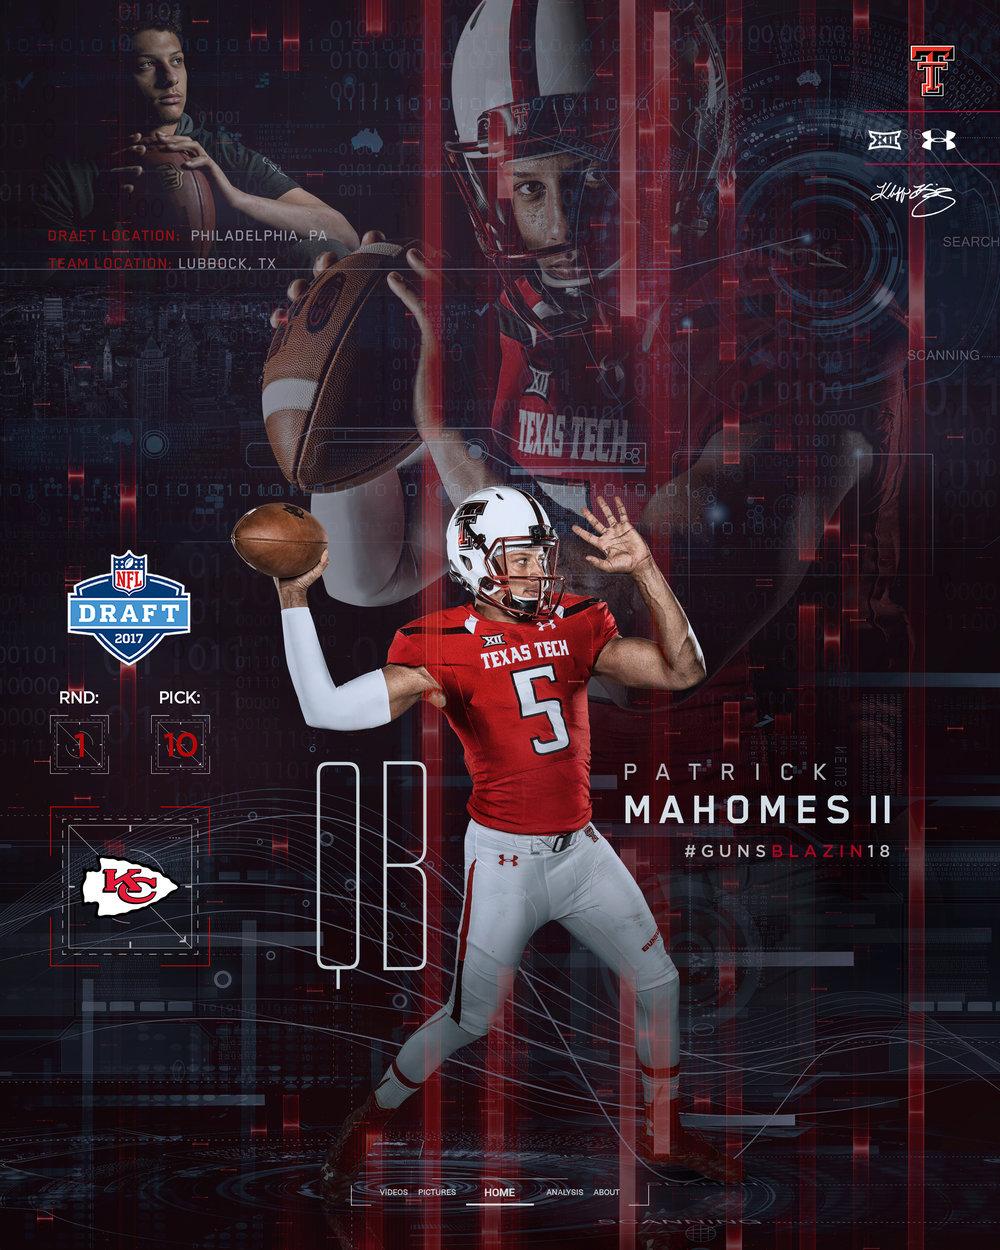 Patrick Mahomes II 2017 NFL Draft Graphic